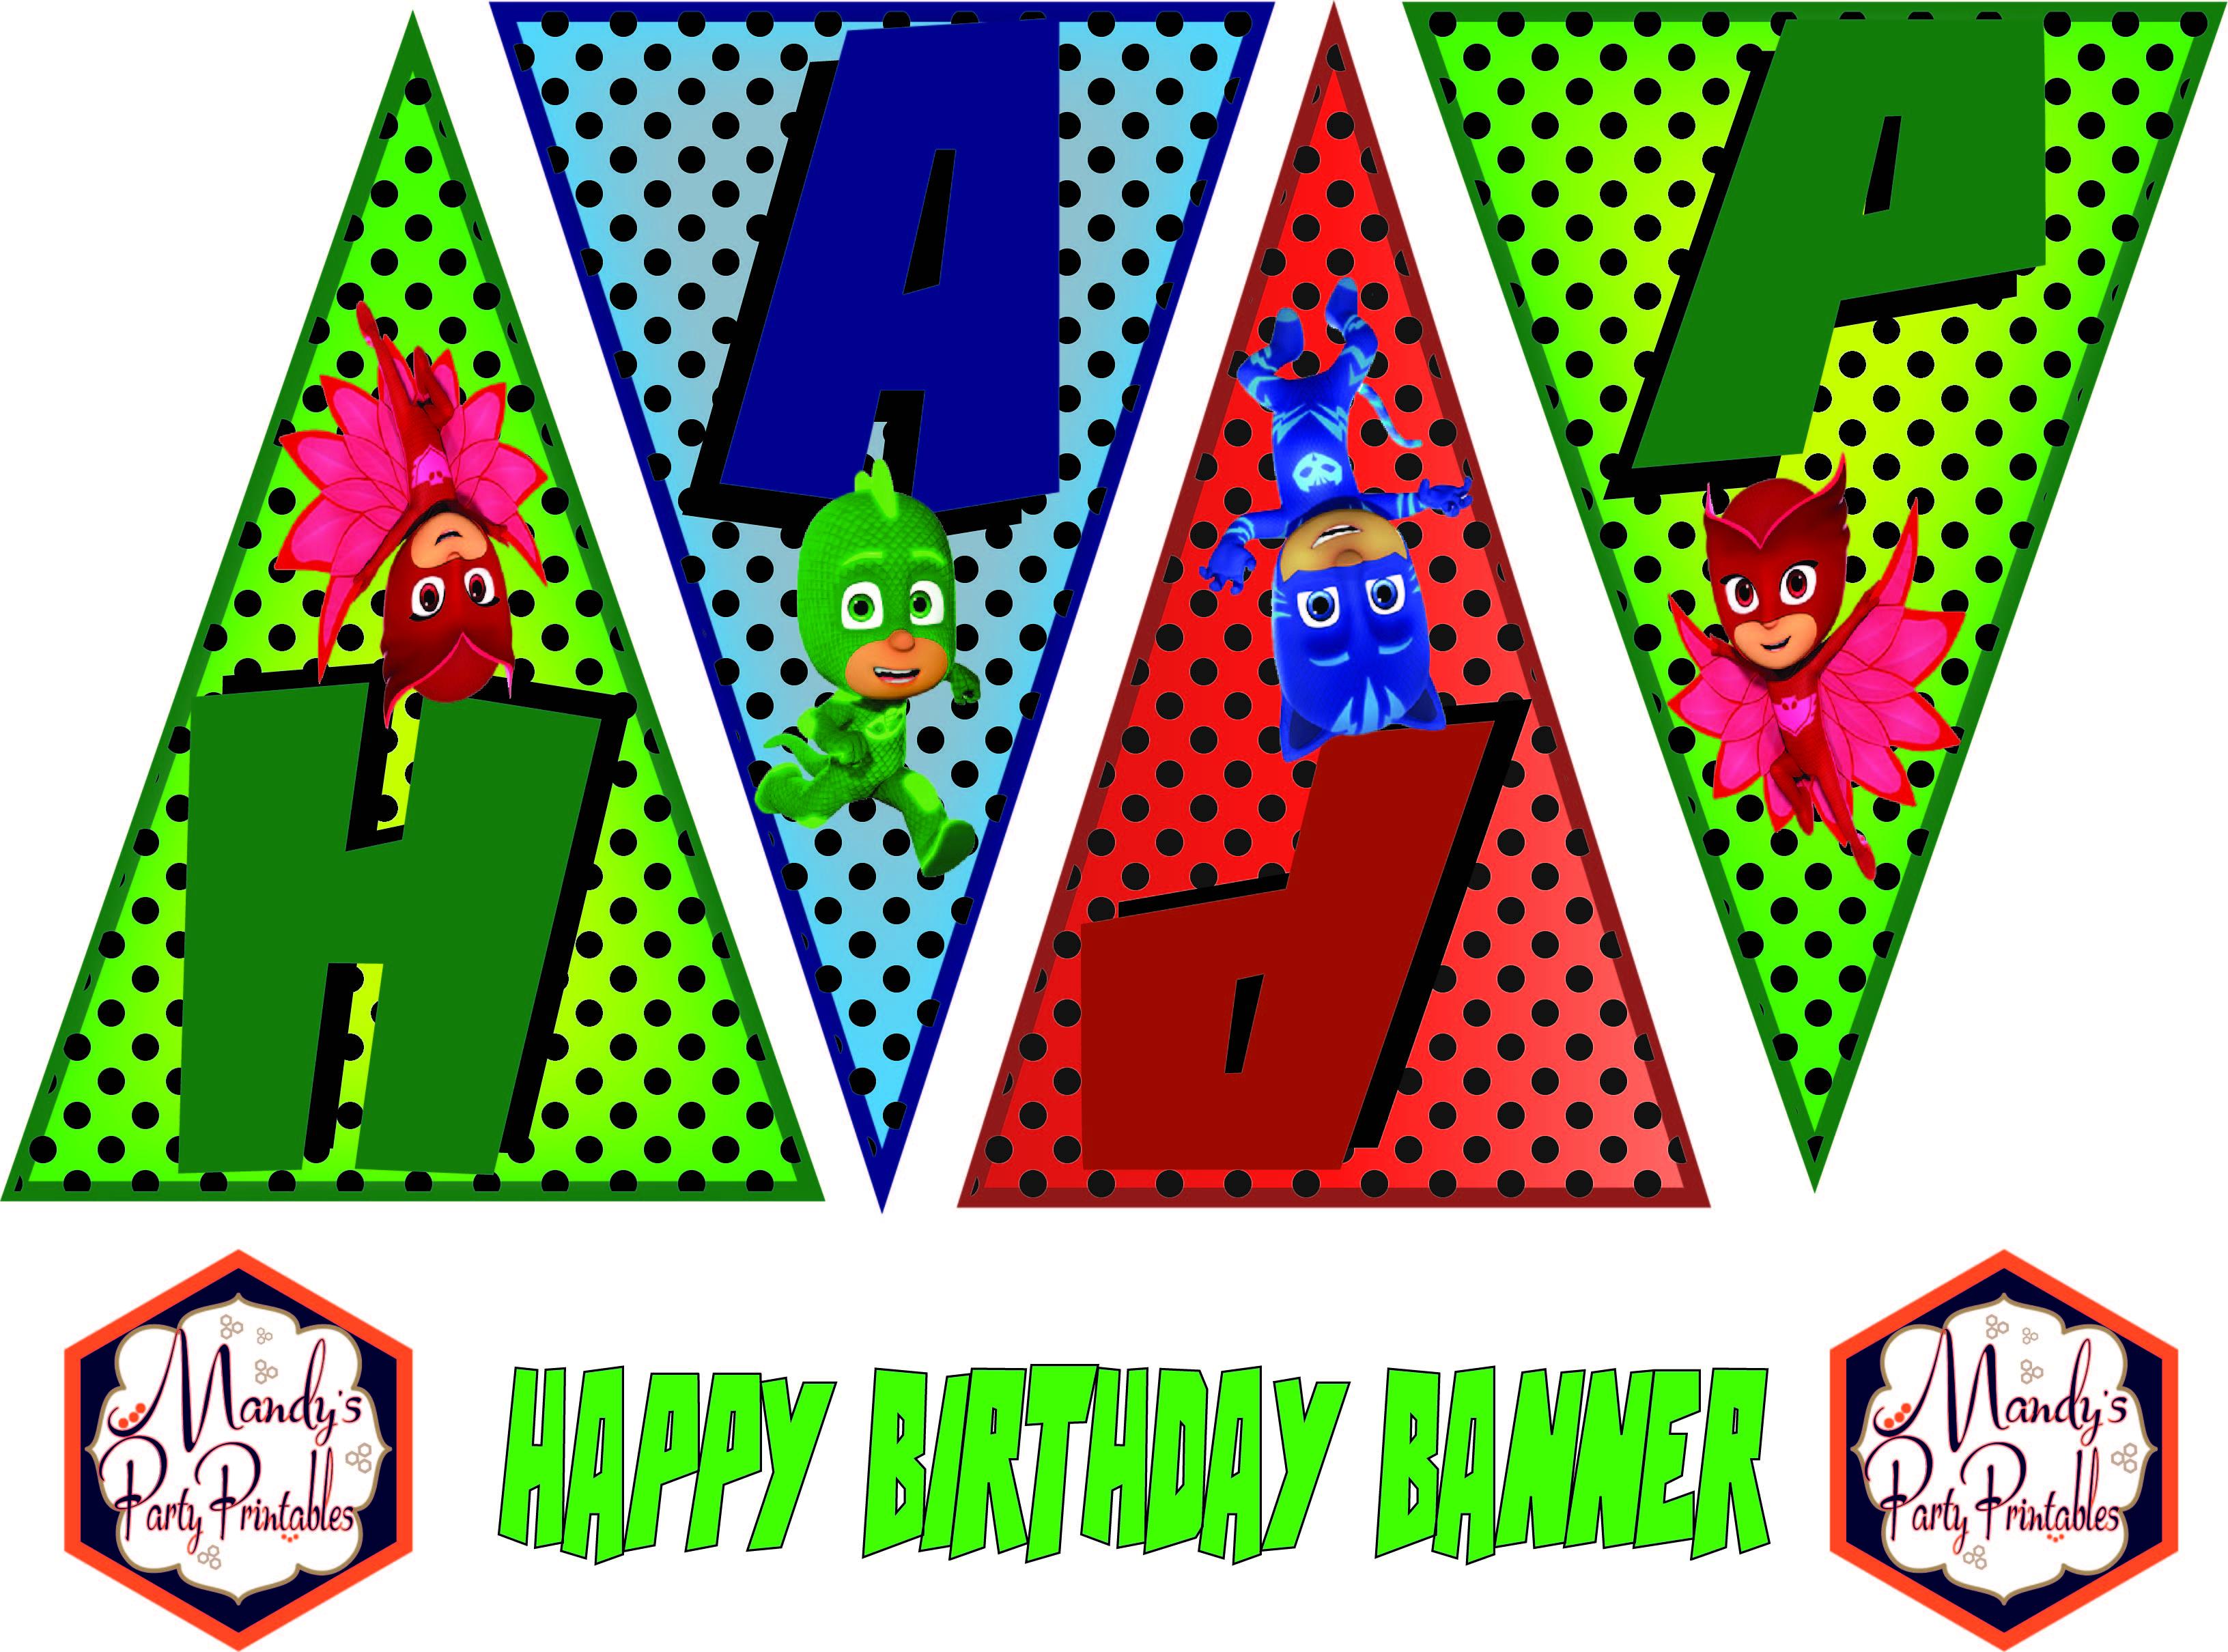 Pj Masks Birthday Quotpj Masks Birthday Partyquot In 2018